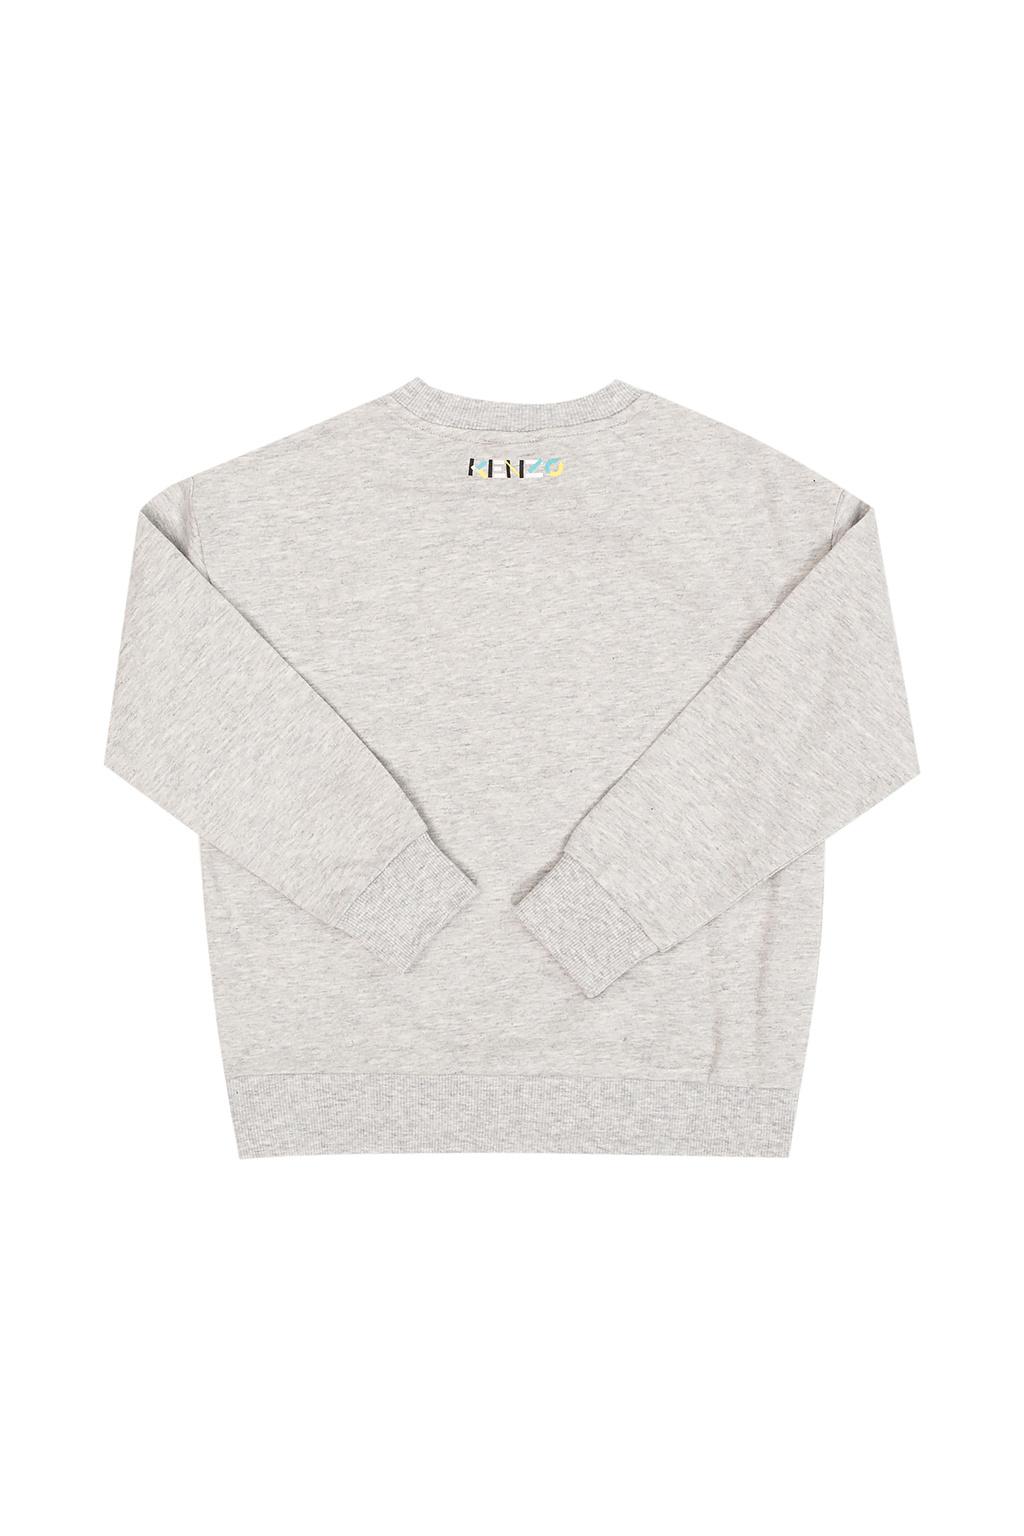 Kenzo Kids Logo-printed sweatshirt